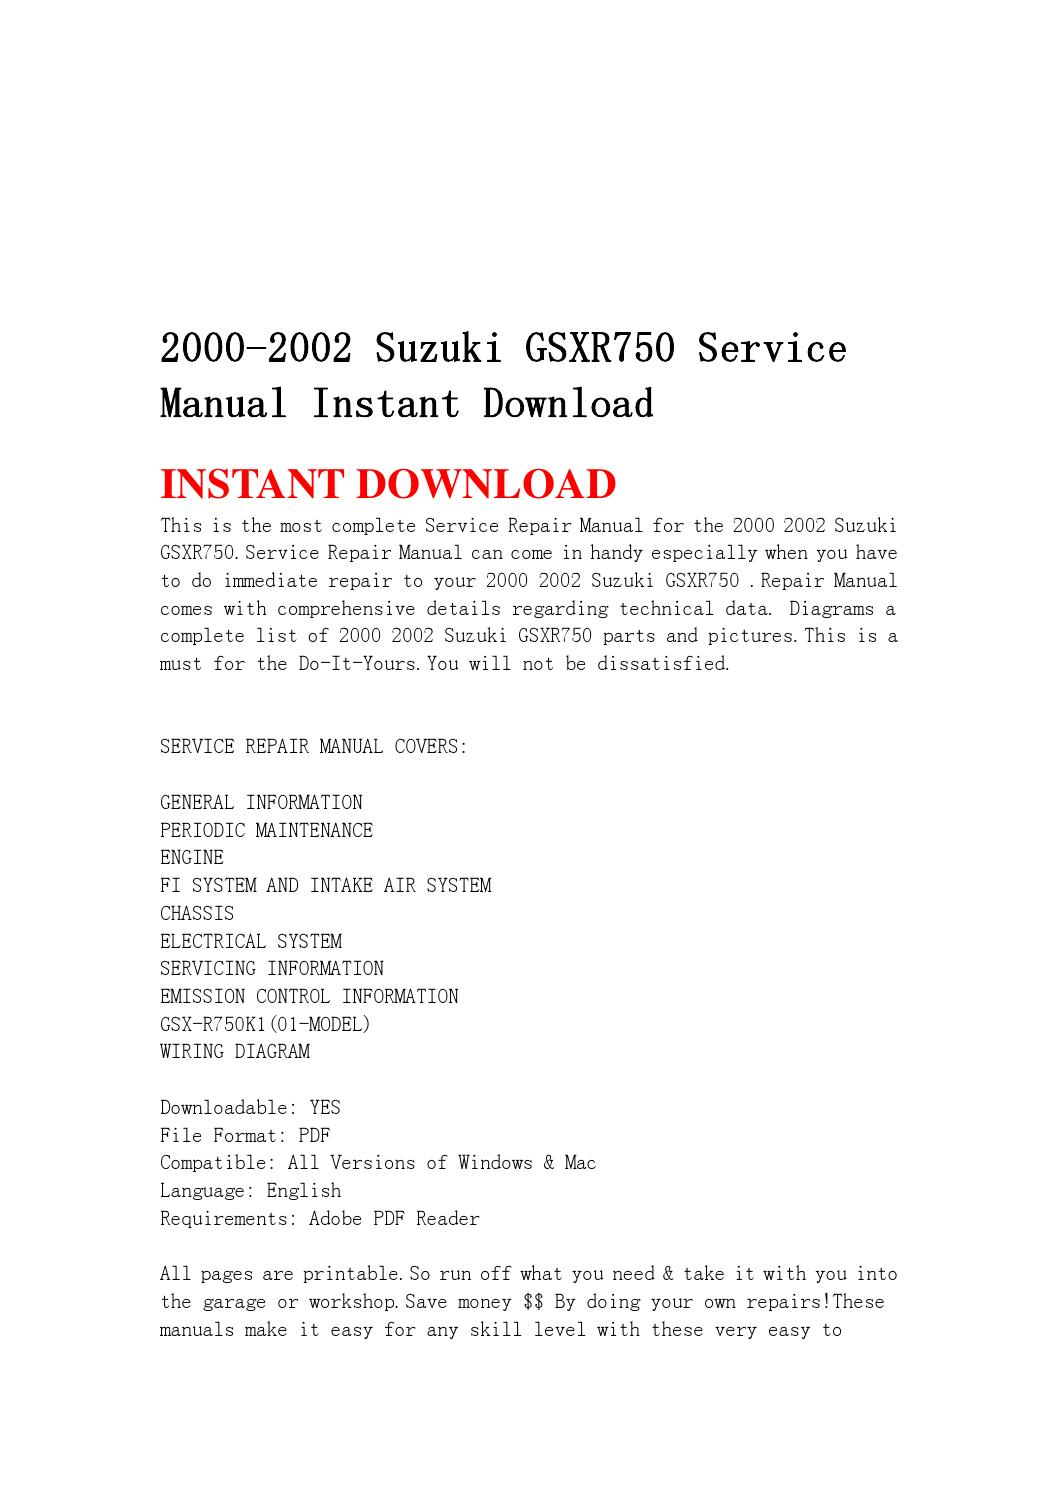 2000 2002 suzuki gsxr750 service manual instant download by jnshefjsne -  issuu